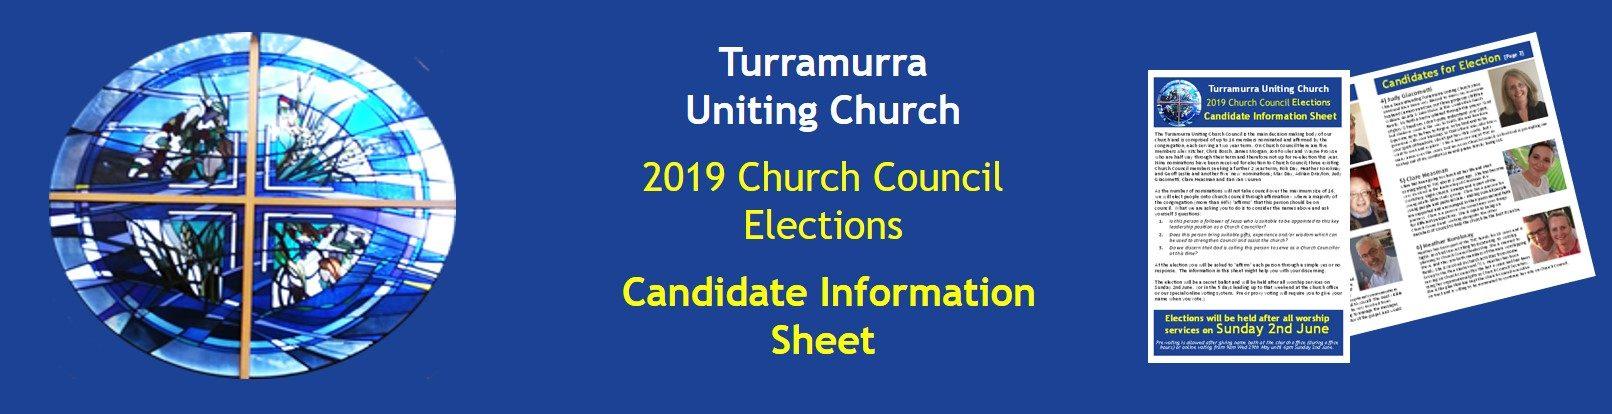 2019 Church Council Election Information Sheet